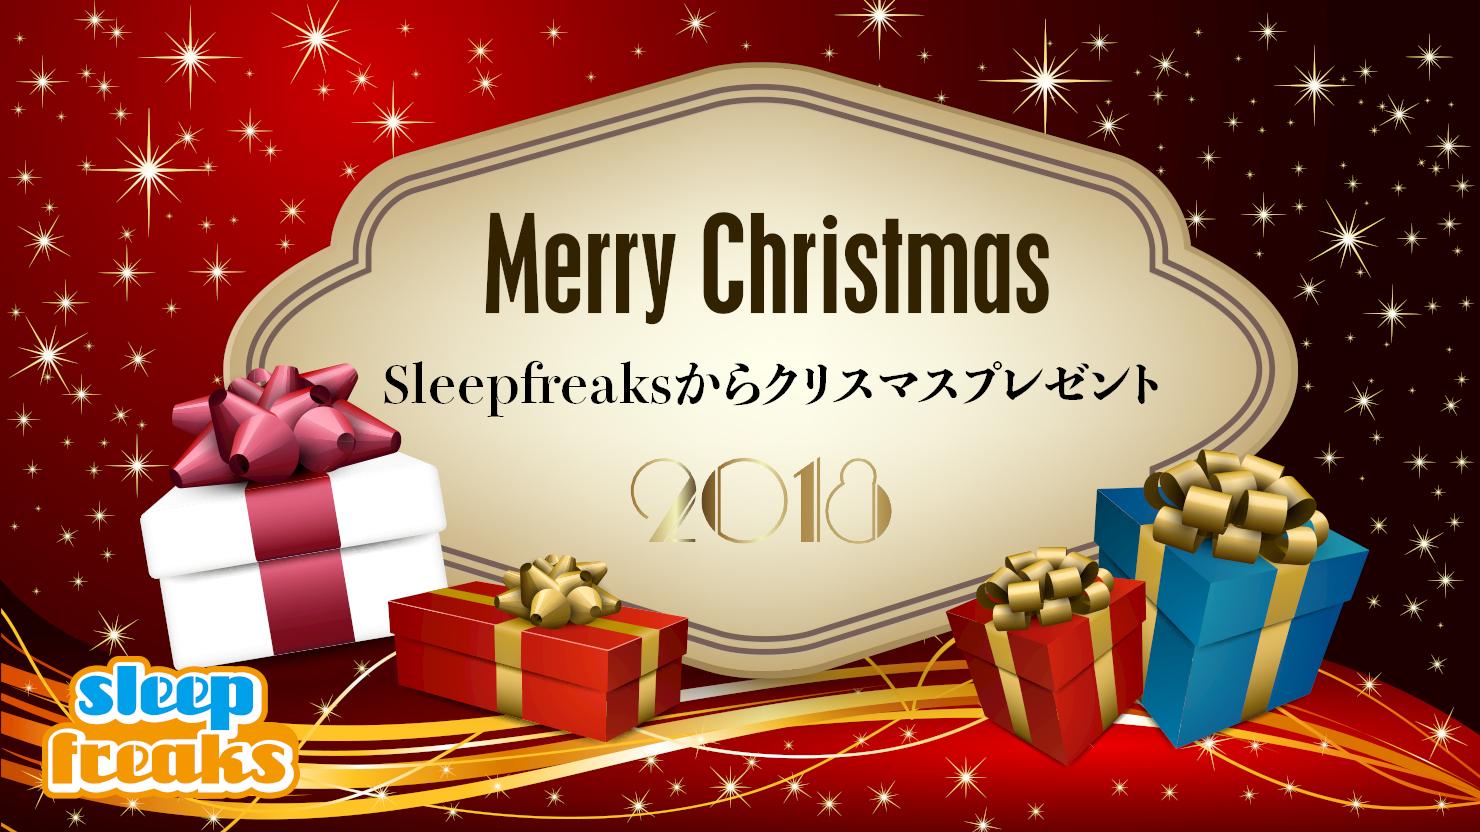 xmas-present-2018-sleepfreaks-1